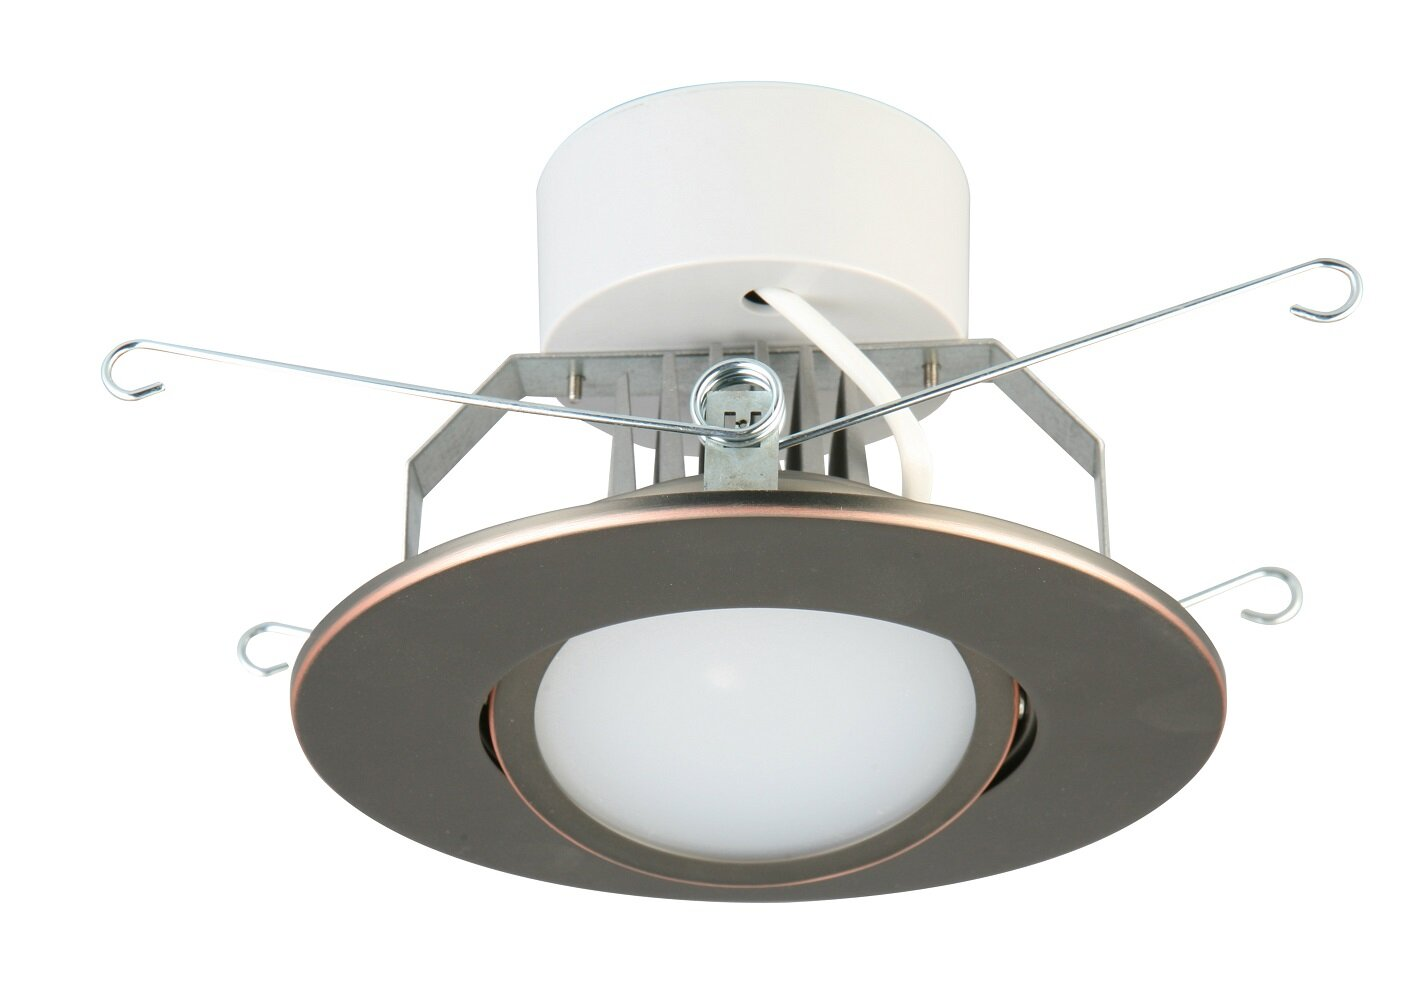 Lithonia Lighting Remodel Led Retrofit Recessed Lighting Kit Wayfair